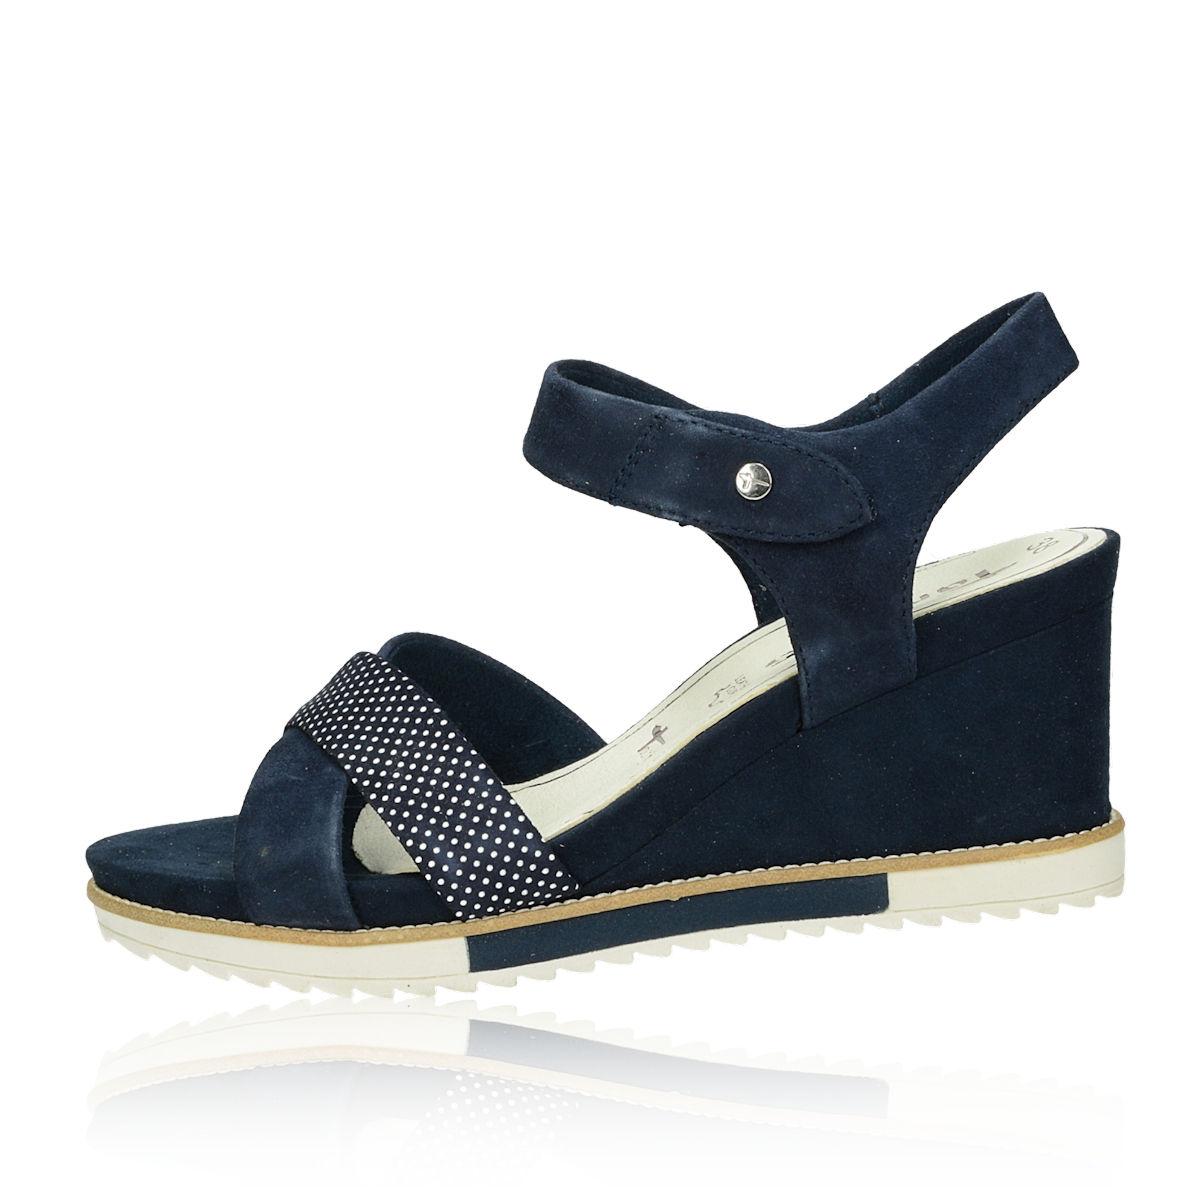 5d4ab3f178a1 Tamaris dámske semišové pohodlné sandále - tmavomodré Tamaris dámske  semišové pohodlné sandále - tmavomodré ...